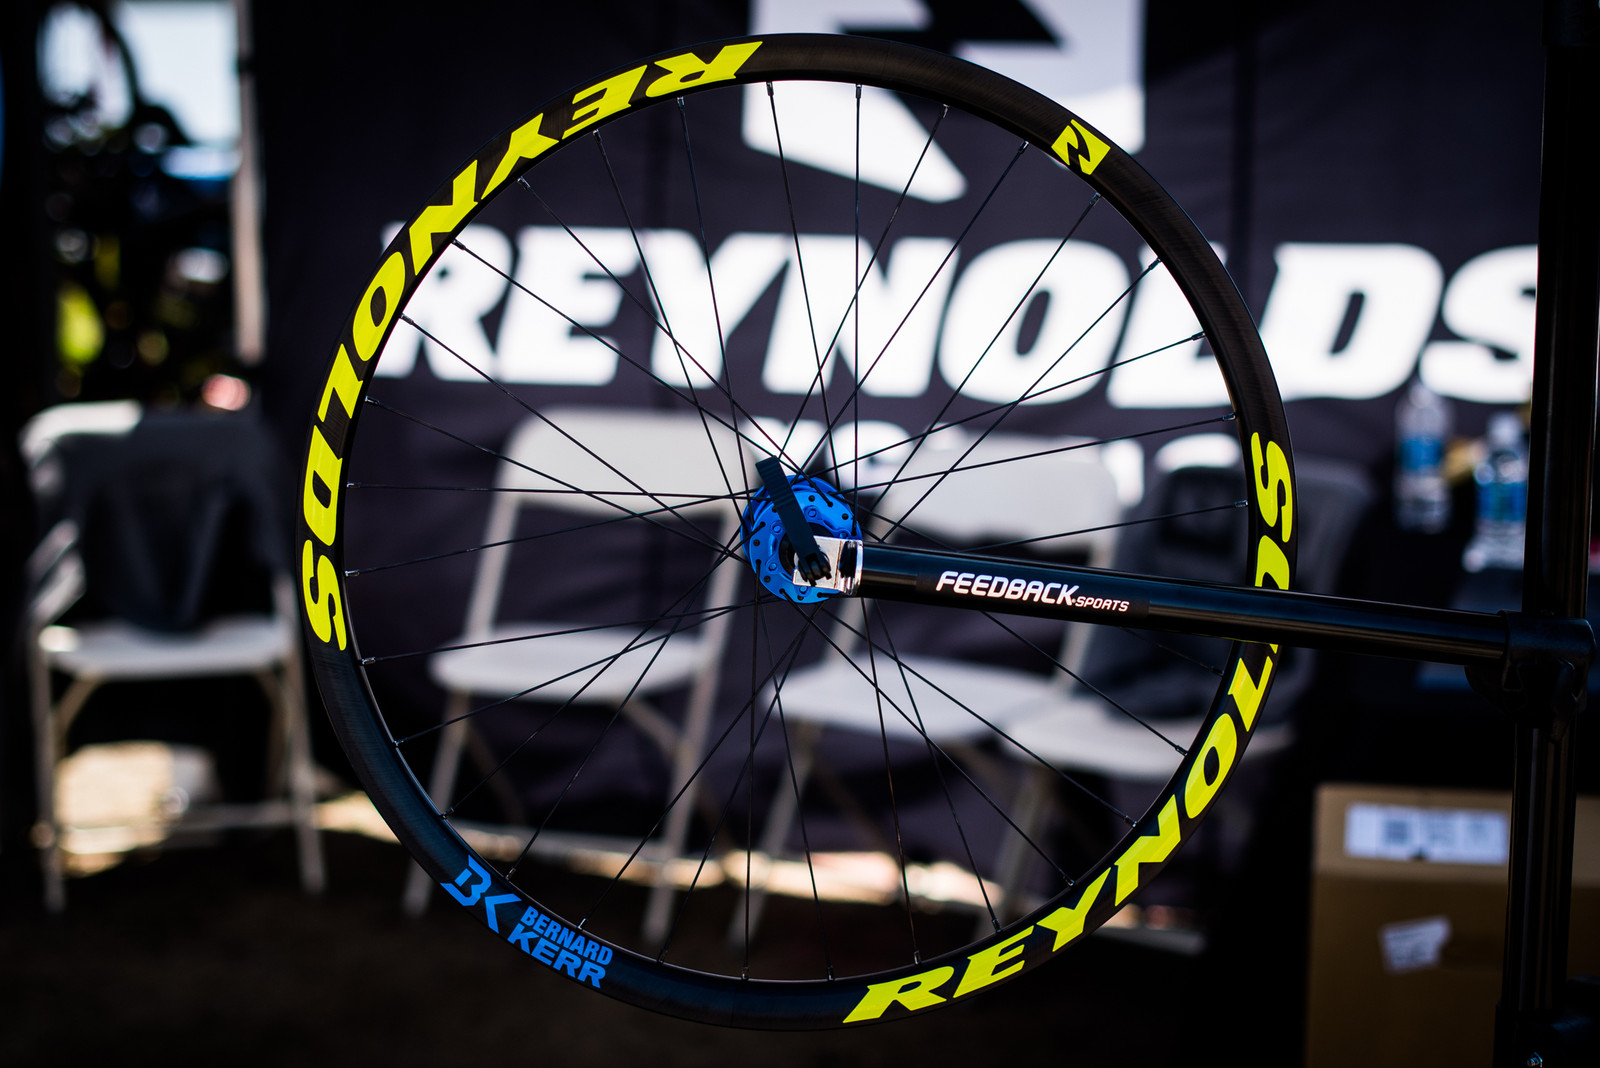 Reynolds Signature Bernard Kerr 27.5 DH Wheelset - 2017 Sea Otter Classic Pit Bits - Mountain Biking Pictures - Vital MTB